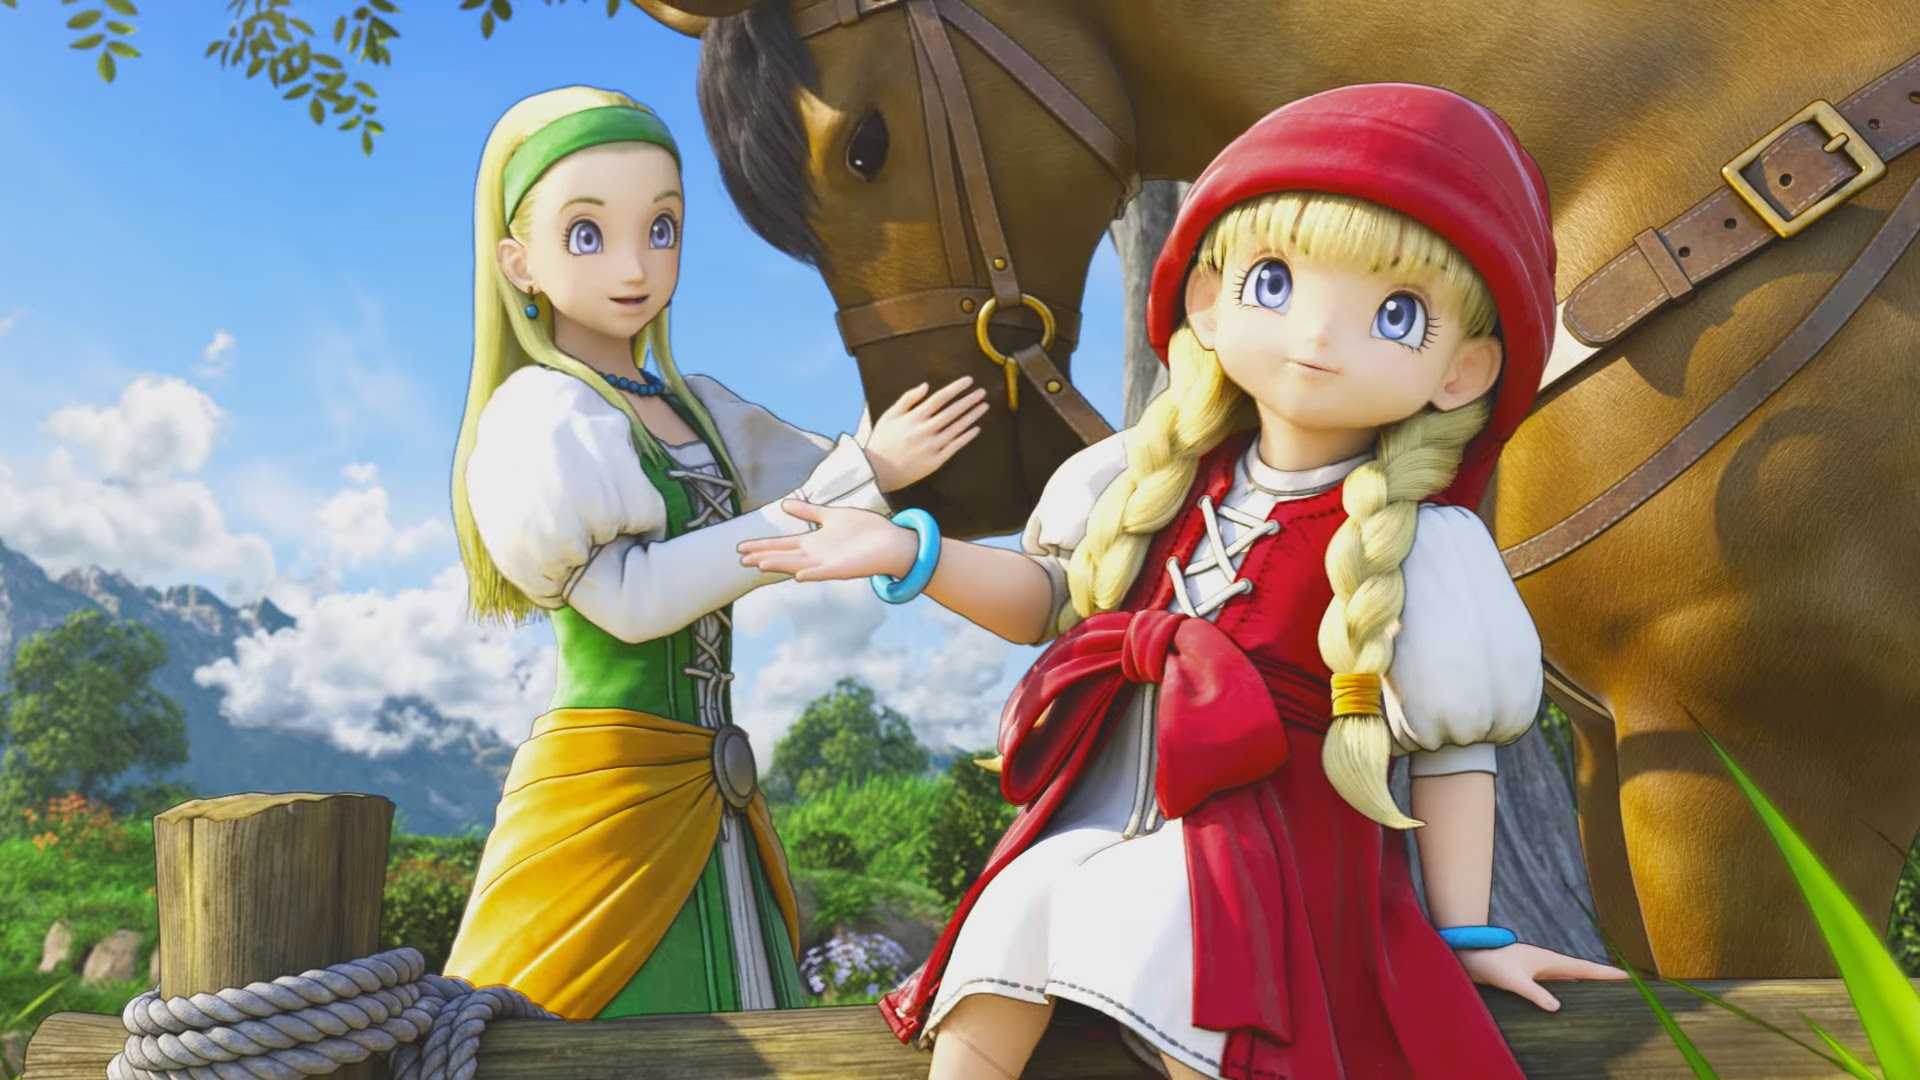 A Dragon Quest XI Nintendo Direct is coming this week screenshot